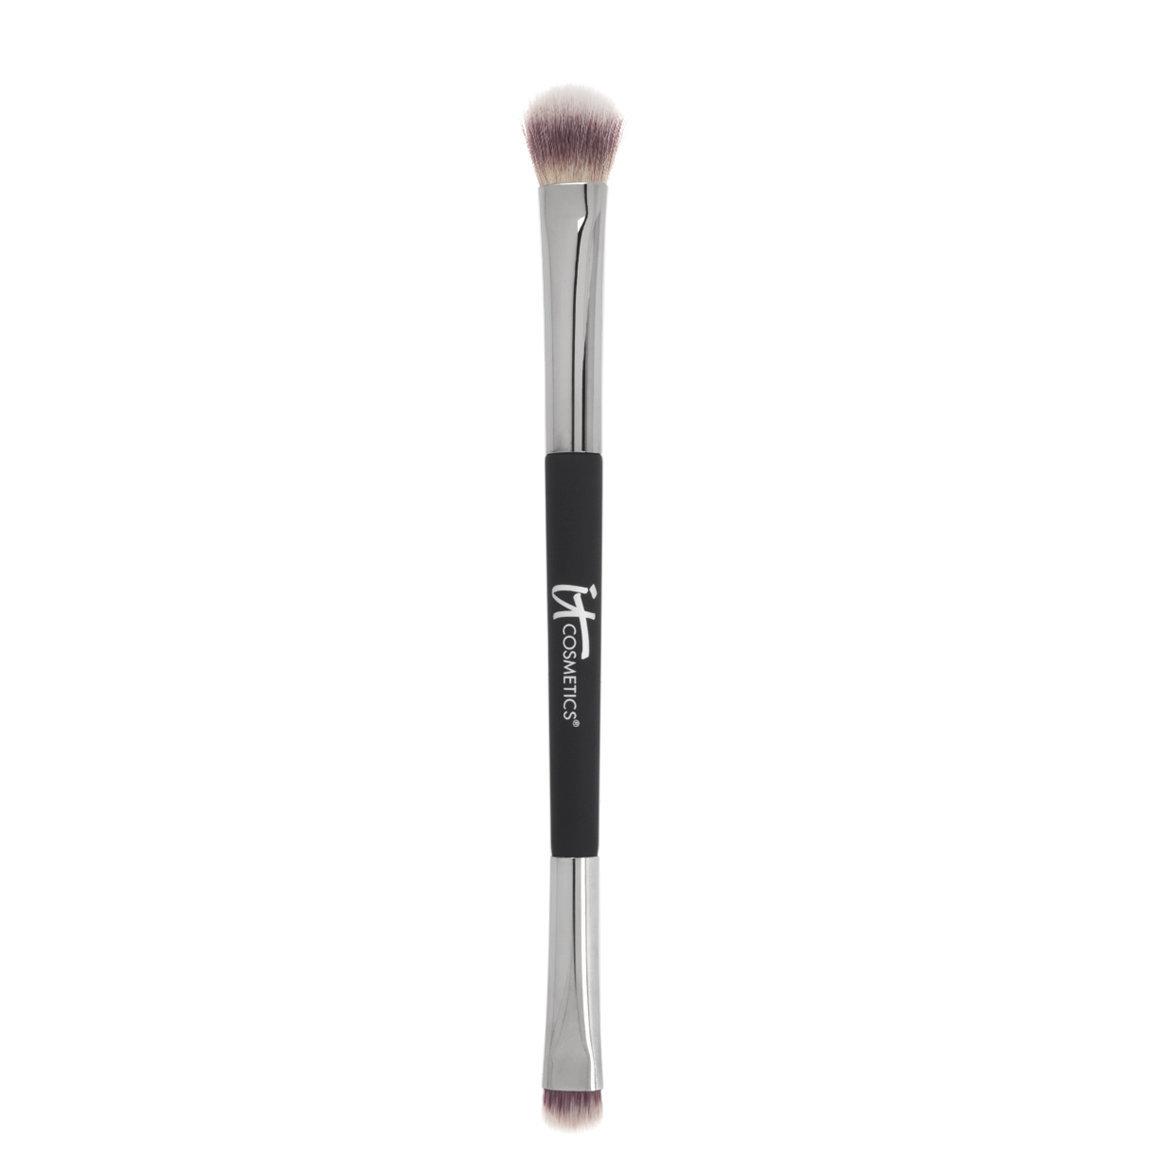 IT Cosmetics  Heavenly Luxe No-Tug Dual Eyeshadow #5 product swatch.